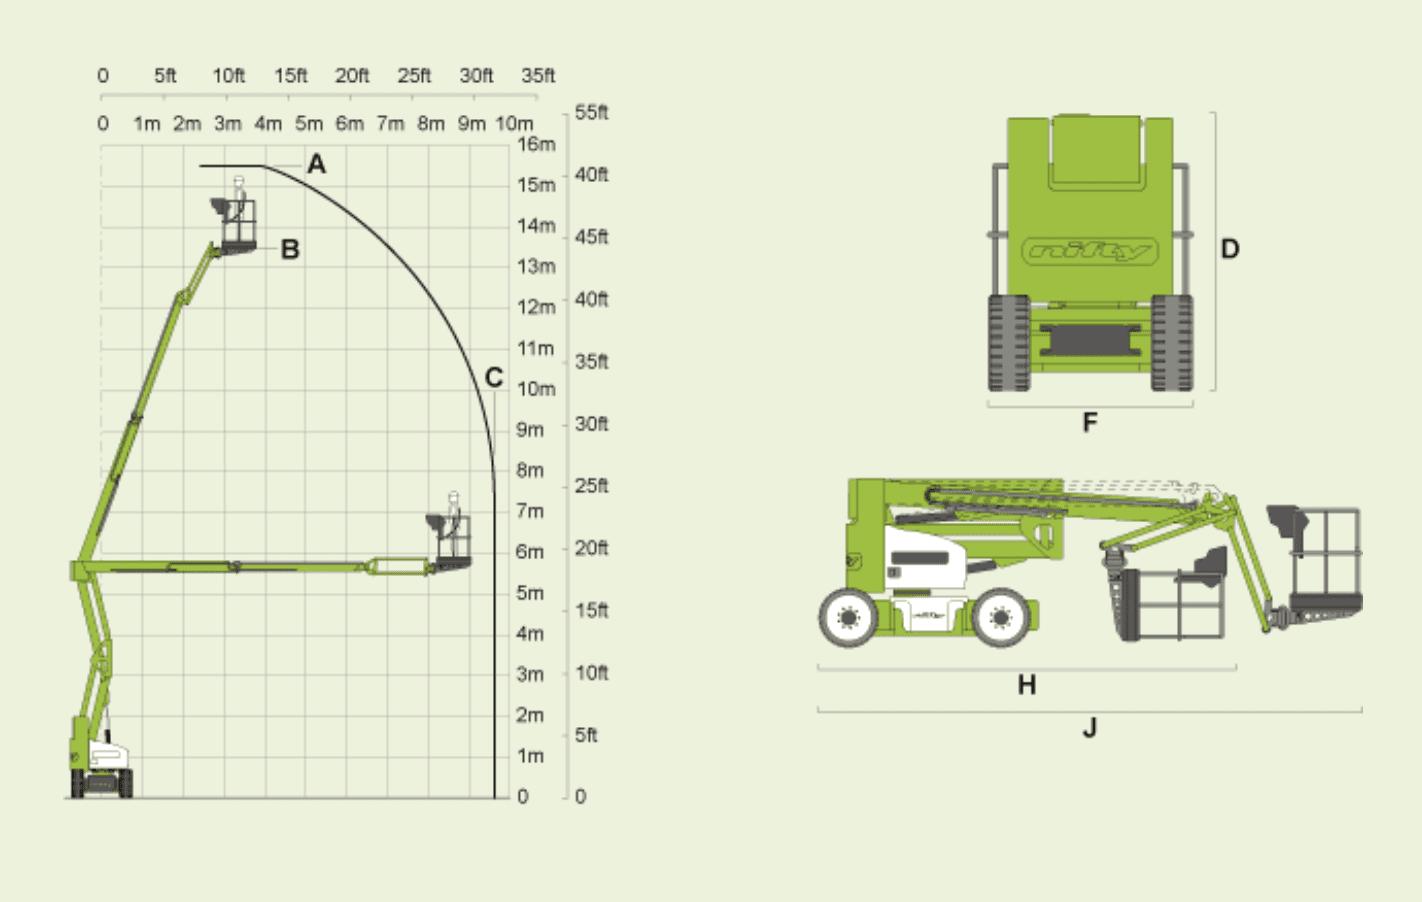 HR15 Narrow diagram